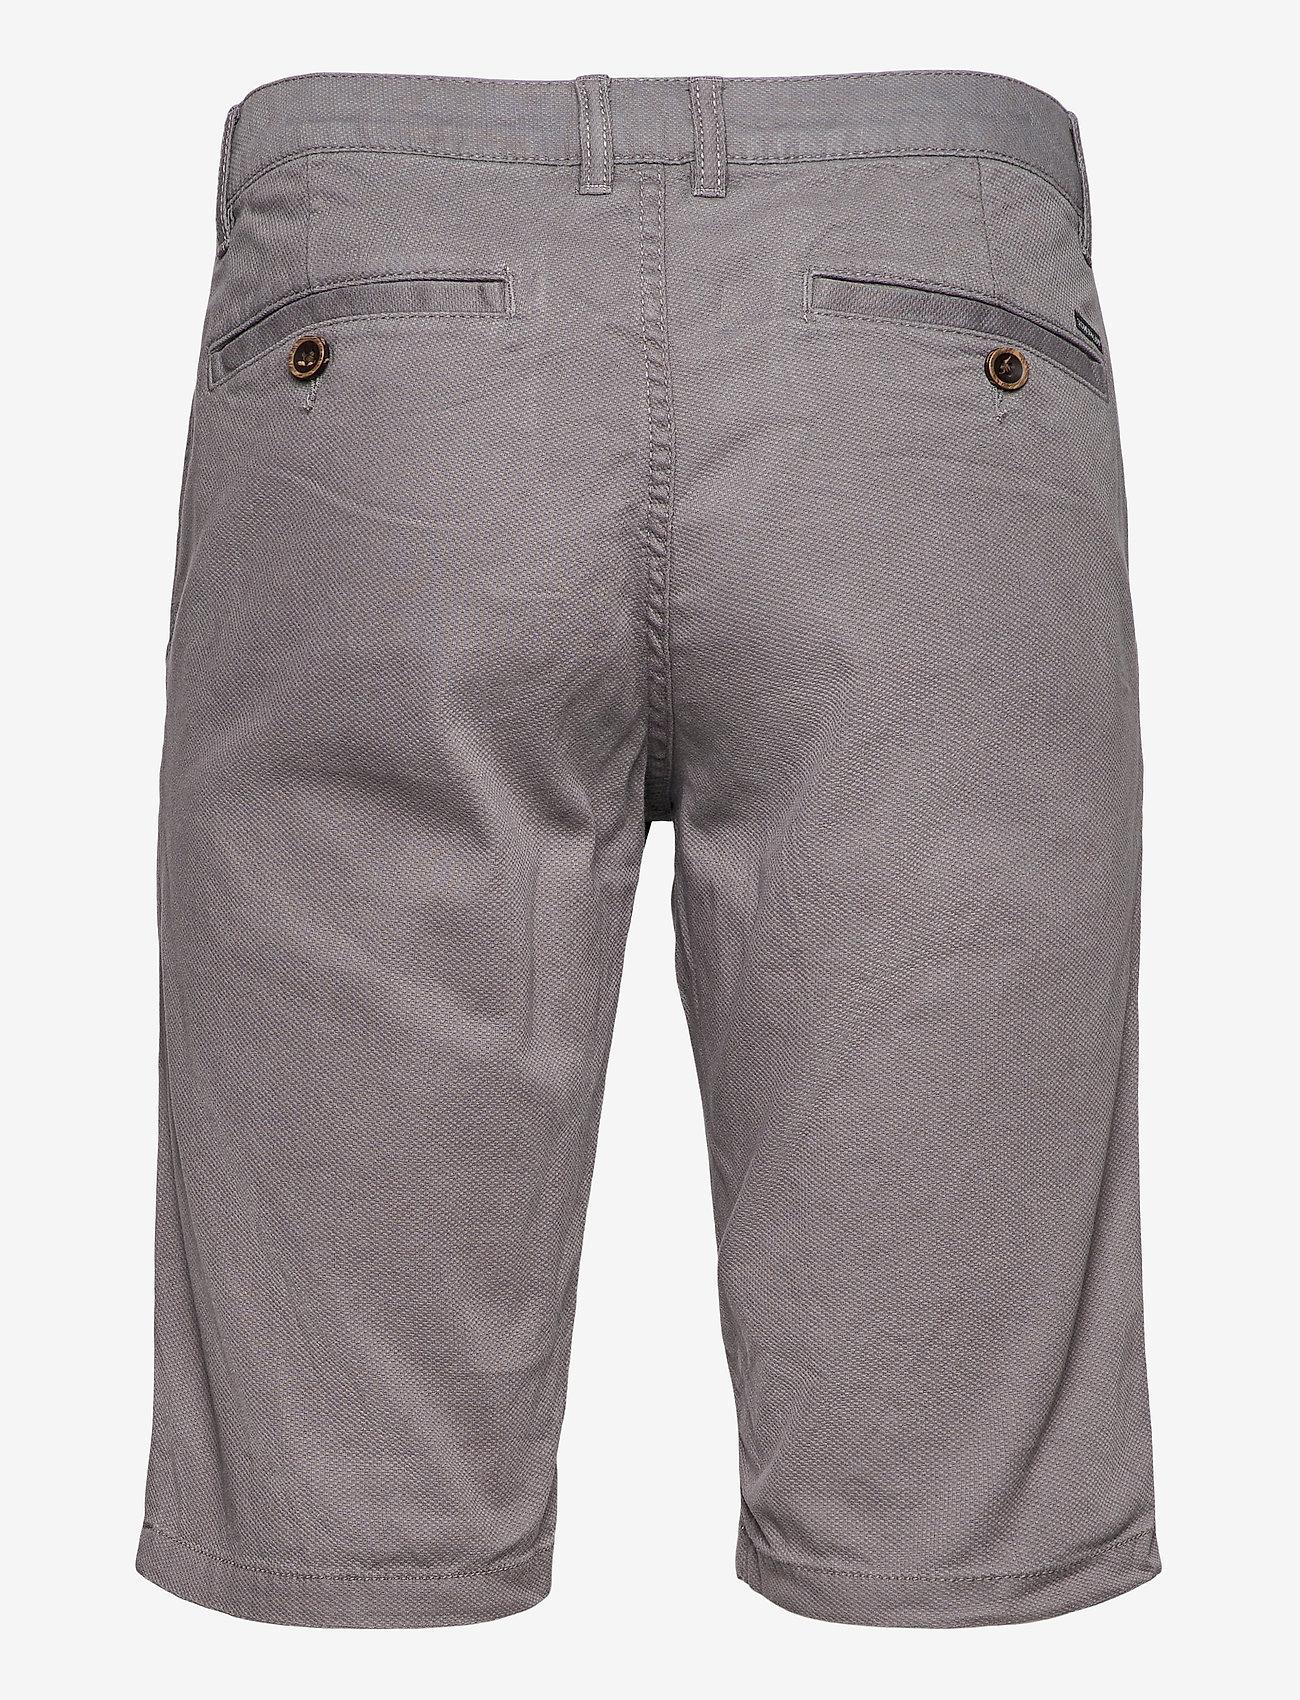 Tom Tailor - chino shorts - chinos shorts - castlerock grey - 1